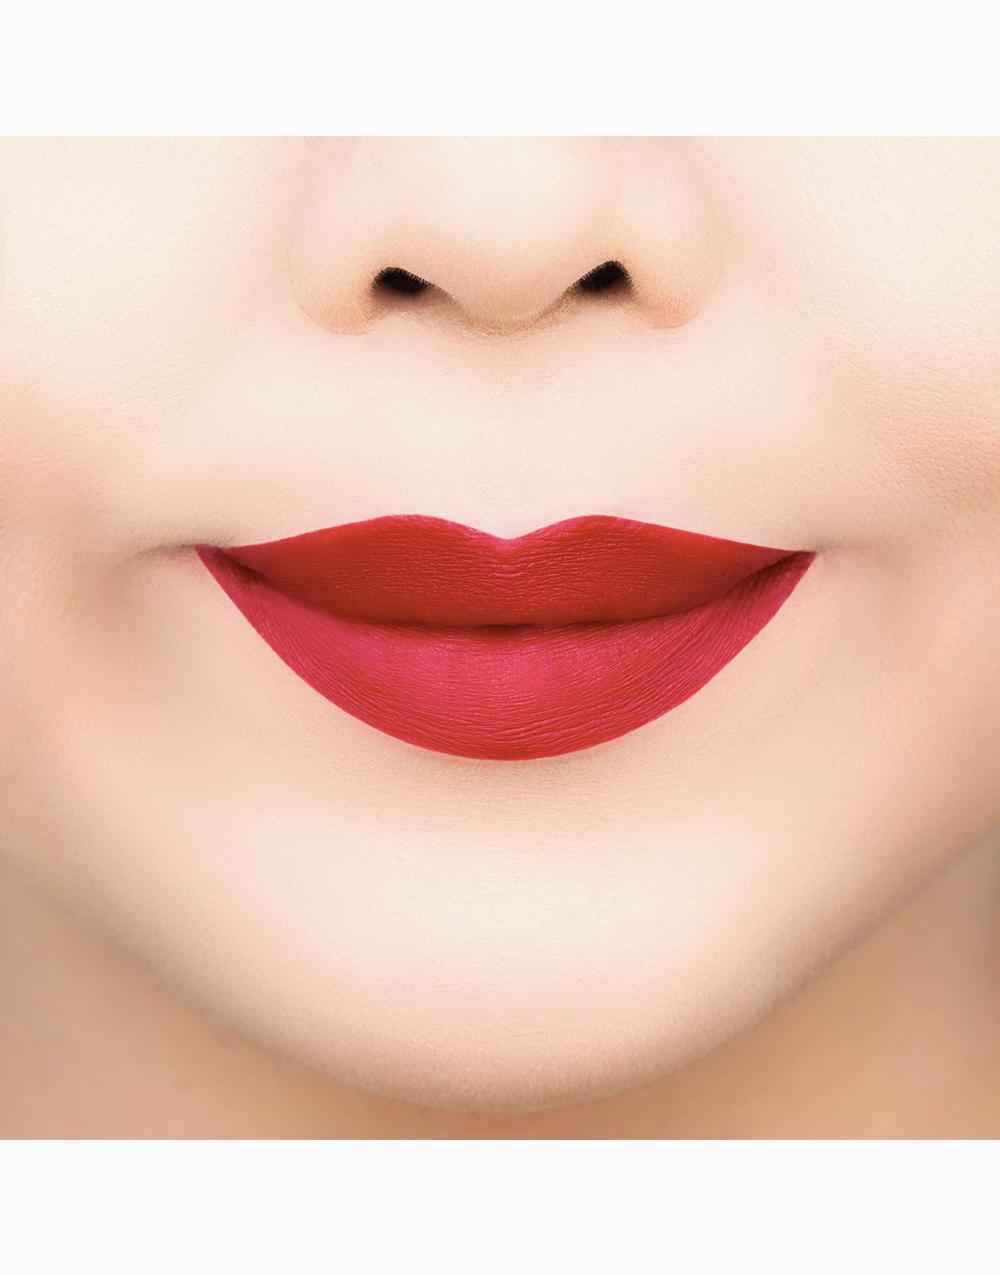 blk Travels Collector's Edition All-Day Intense Matte Lipstick Set in LA/Paris by BLK Cosmetics